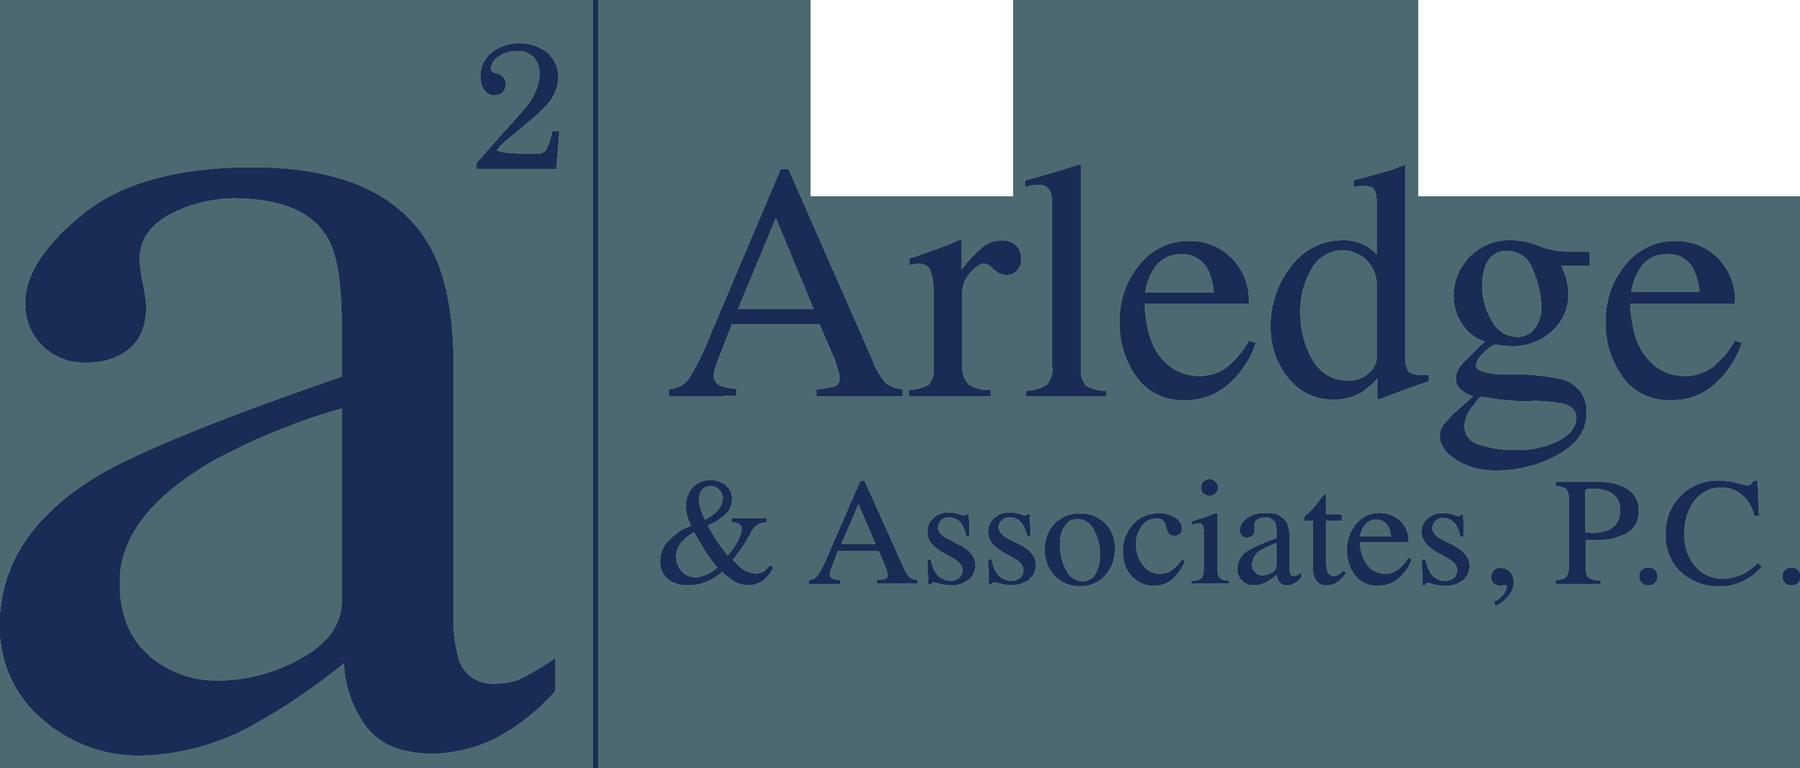 Arledge & Associates